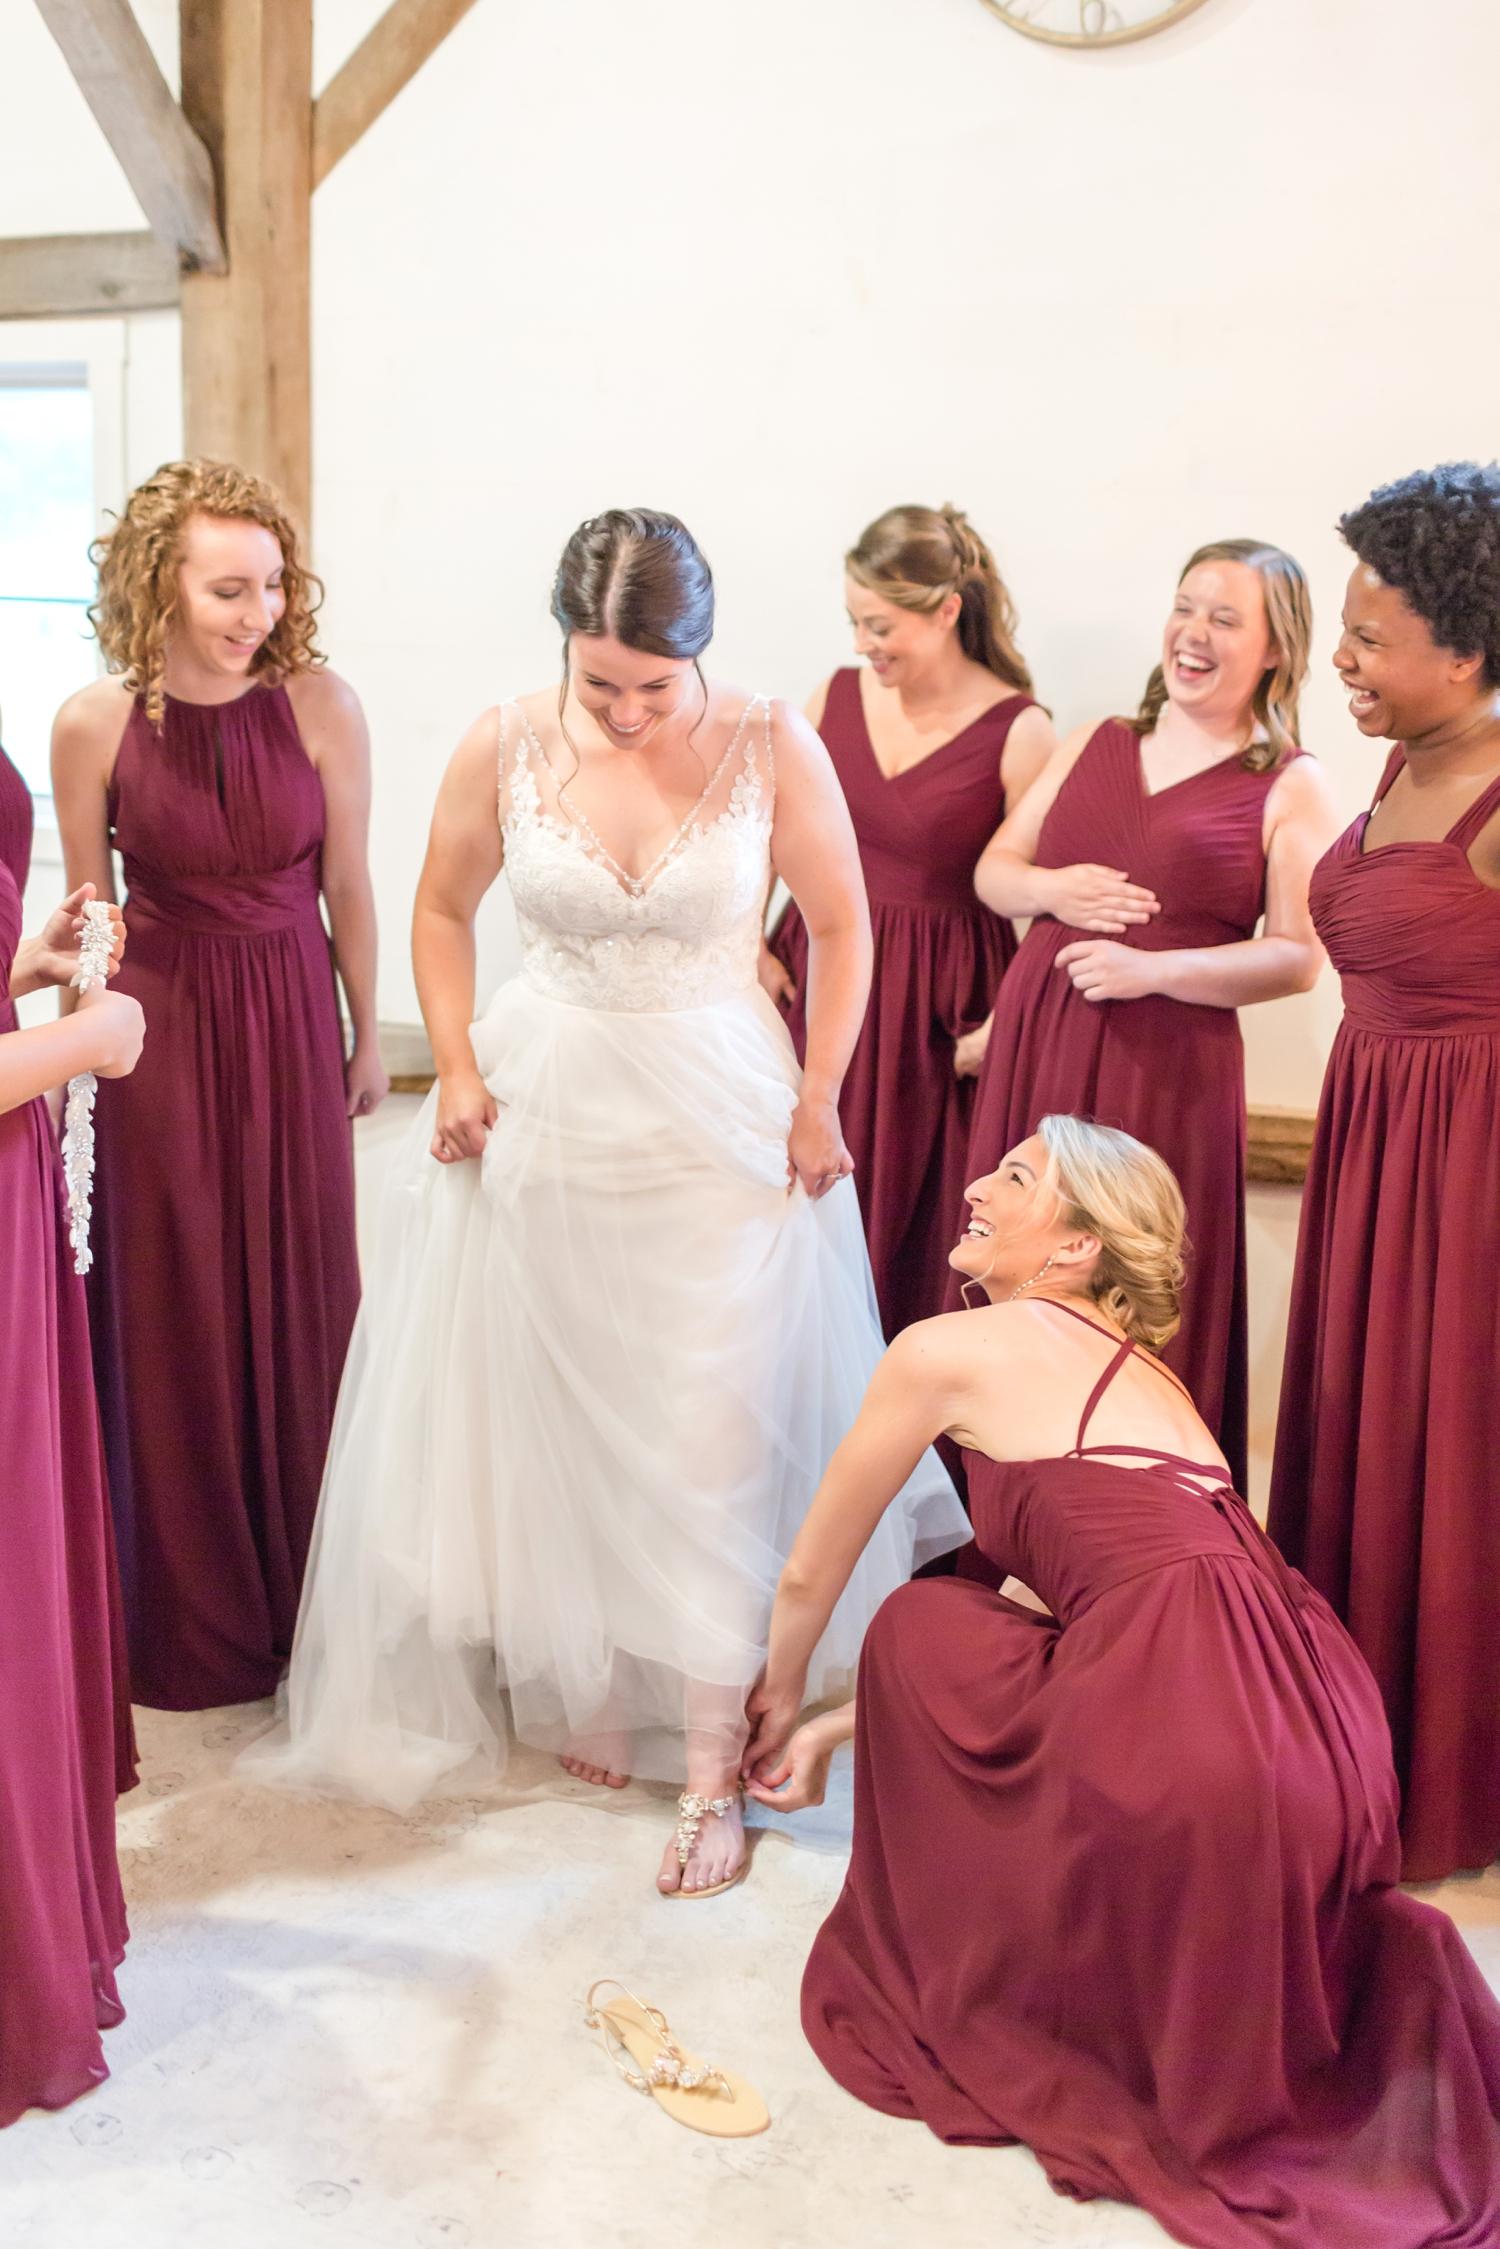 ADKINS WEDDING HIGHLIGHTS-73_The-Granary-wedding-Valley-Pike-Farm-Market-Virginia-wedding-photographer-anna-grace-photography-photo.jpg